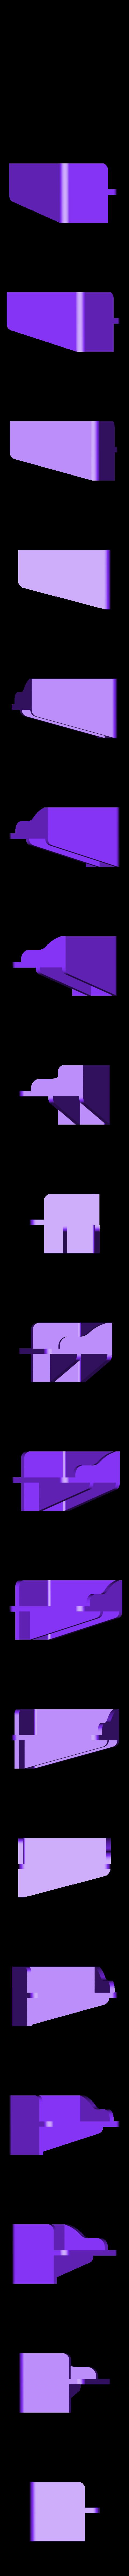 Mirrorpilot_step_1.STL Download free STL file 4-8-8-4 Big Boy Locomotive • 3D printer object, RaymondDeLuca